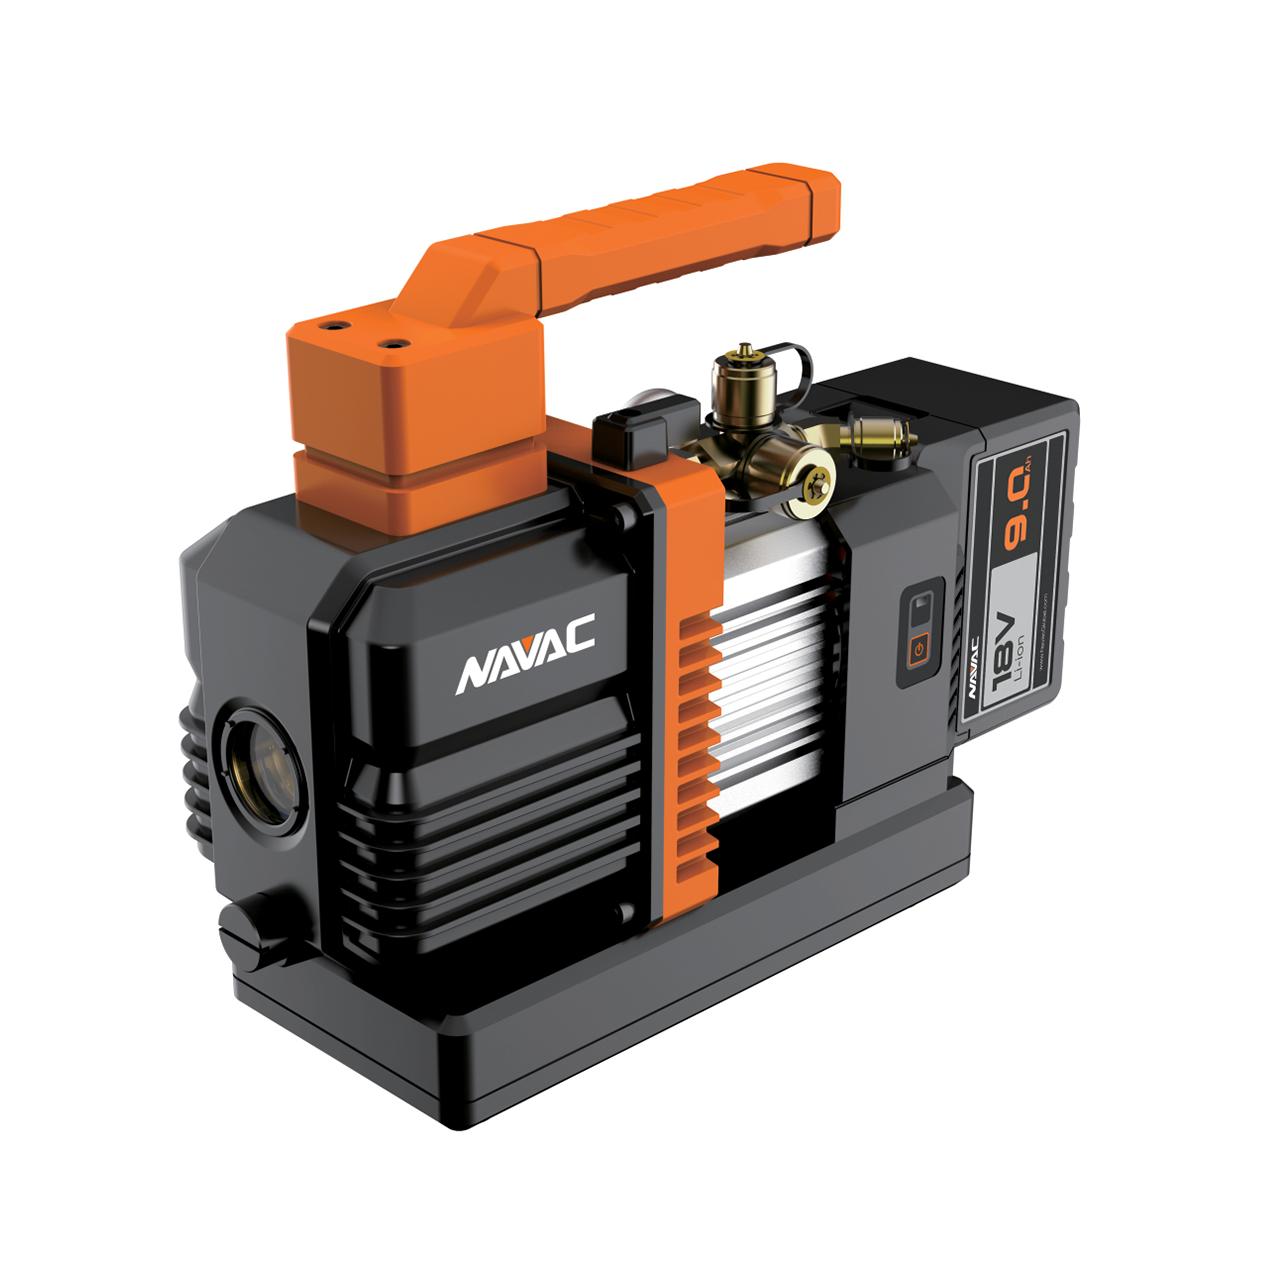 Cordless Vacuum Pump - NP4DLM, 4 CFM, Cordless, BreakFree Series